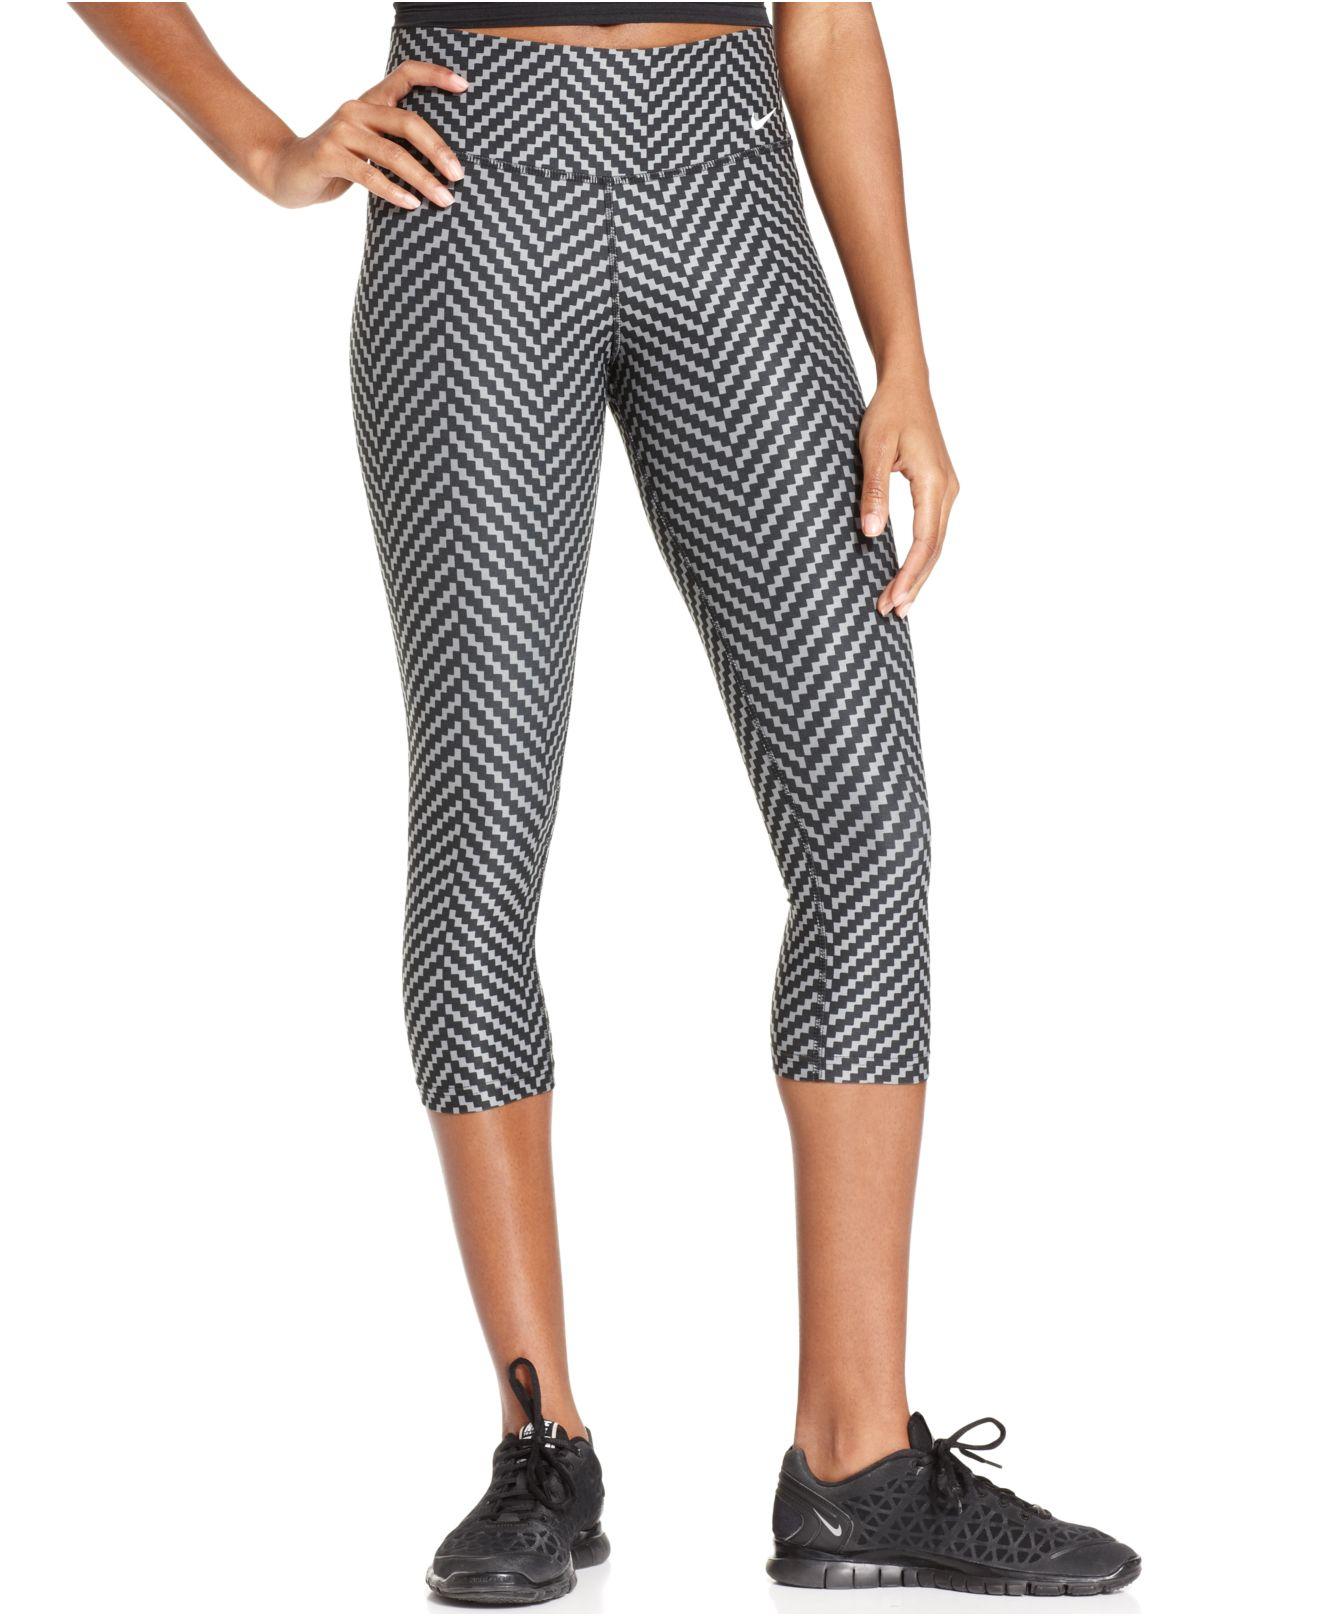 ff959828ee7d4 Lyst - Nike Legend 20 Printed Drifit Capri Leggings in Gray